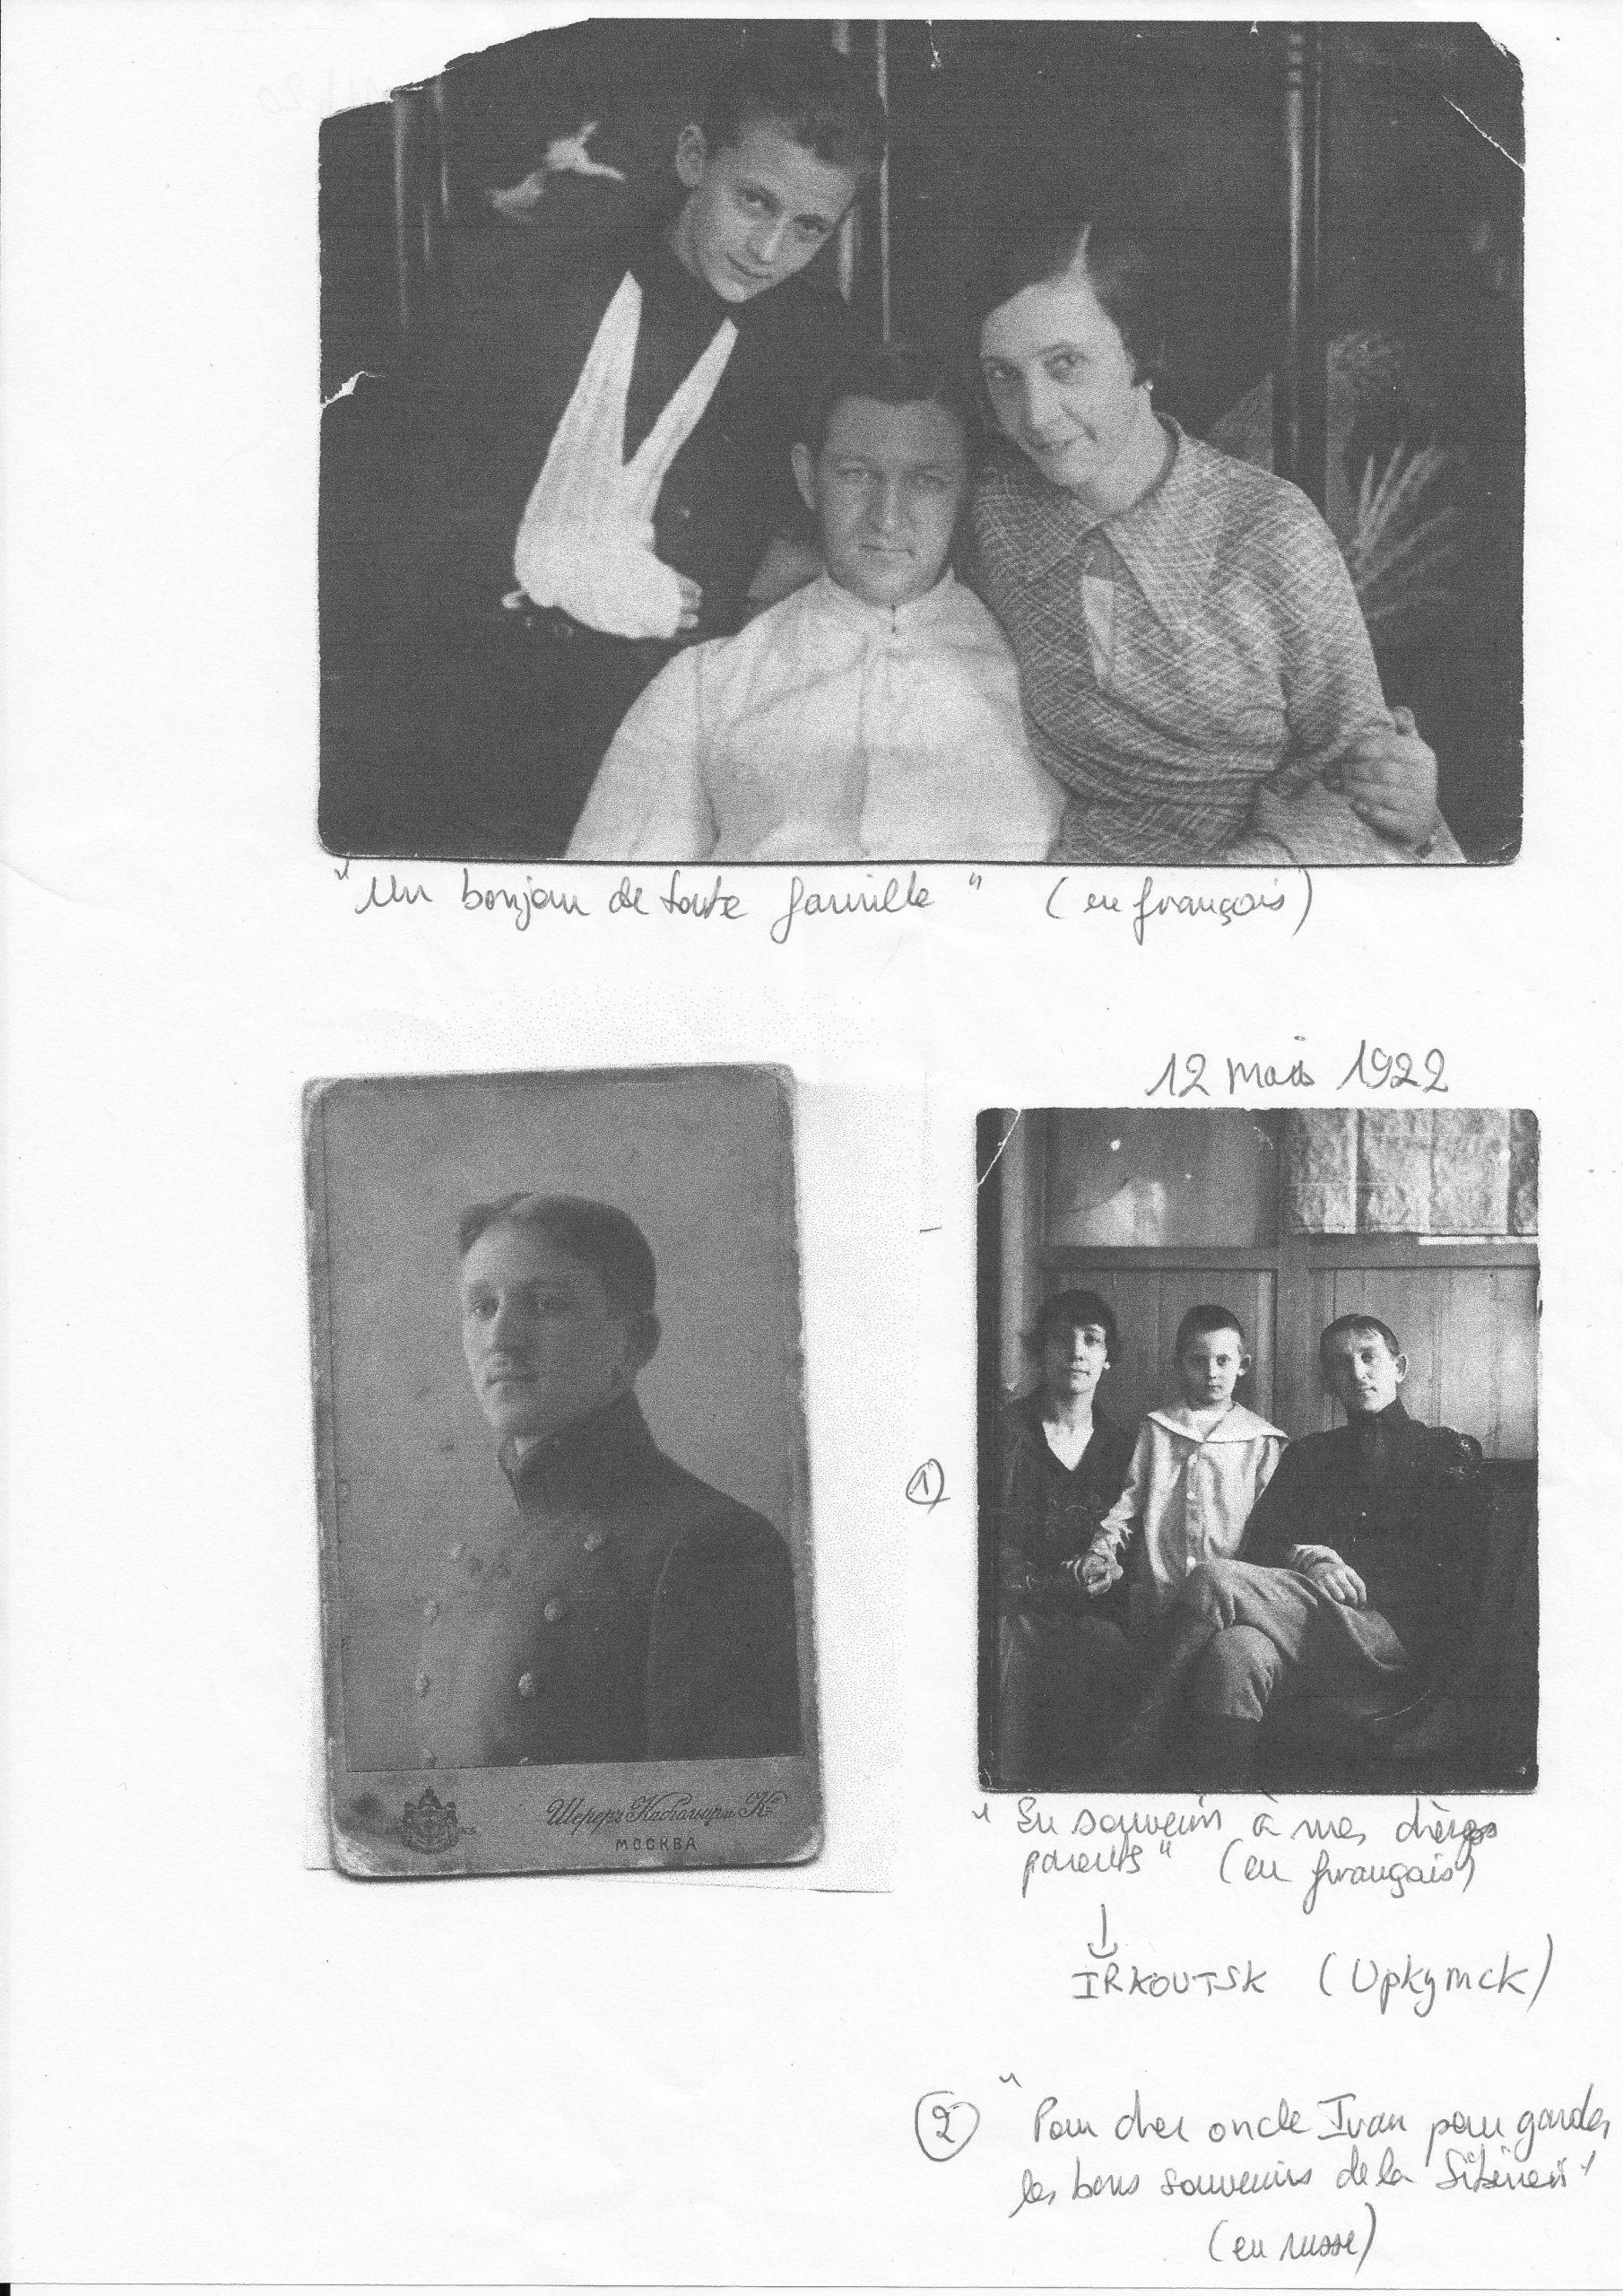 La famille : Mélanie, Sergey et Igor